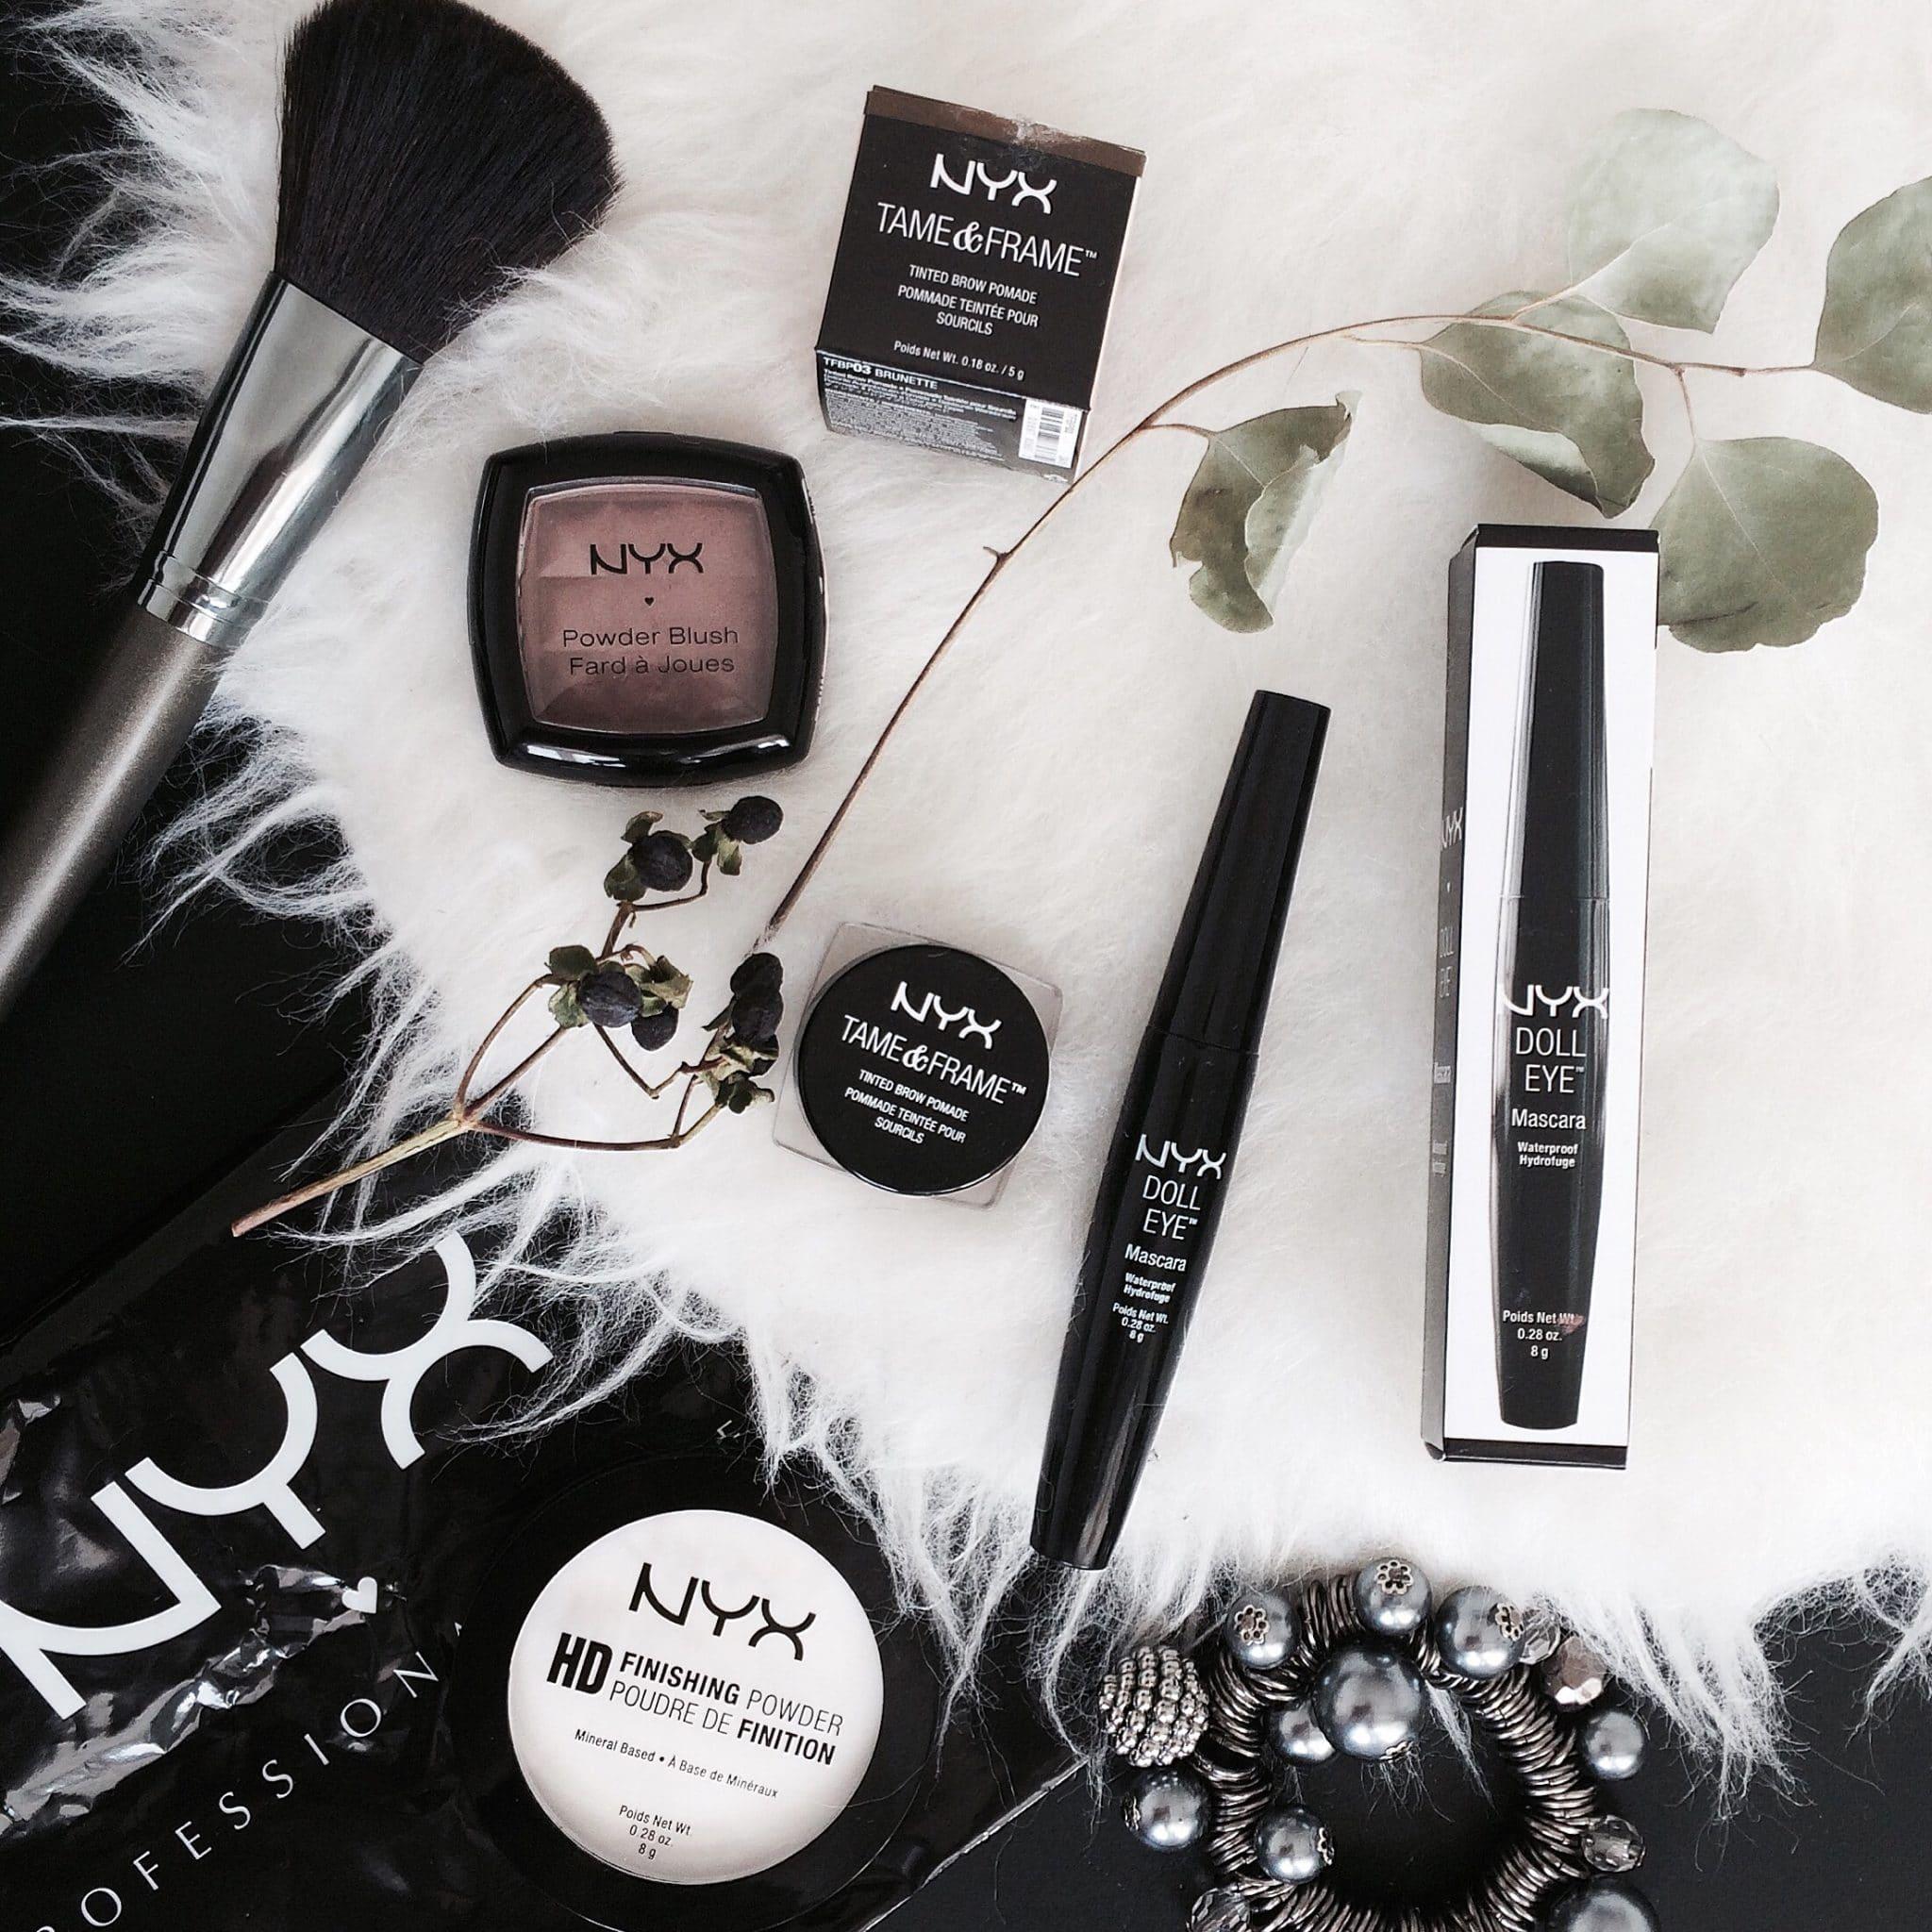 Les Meilleurs Produits de la Marque Nyx Cosmetics